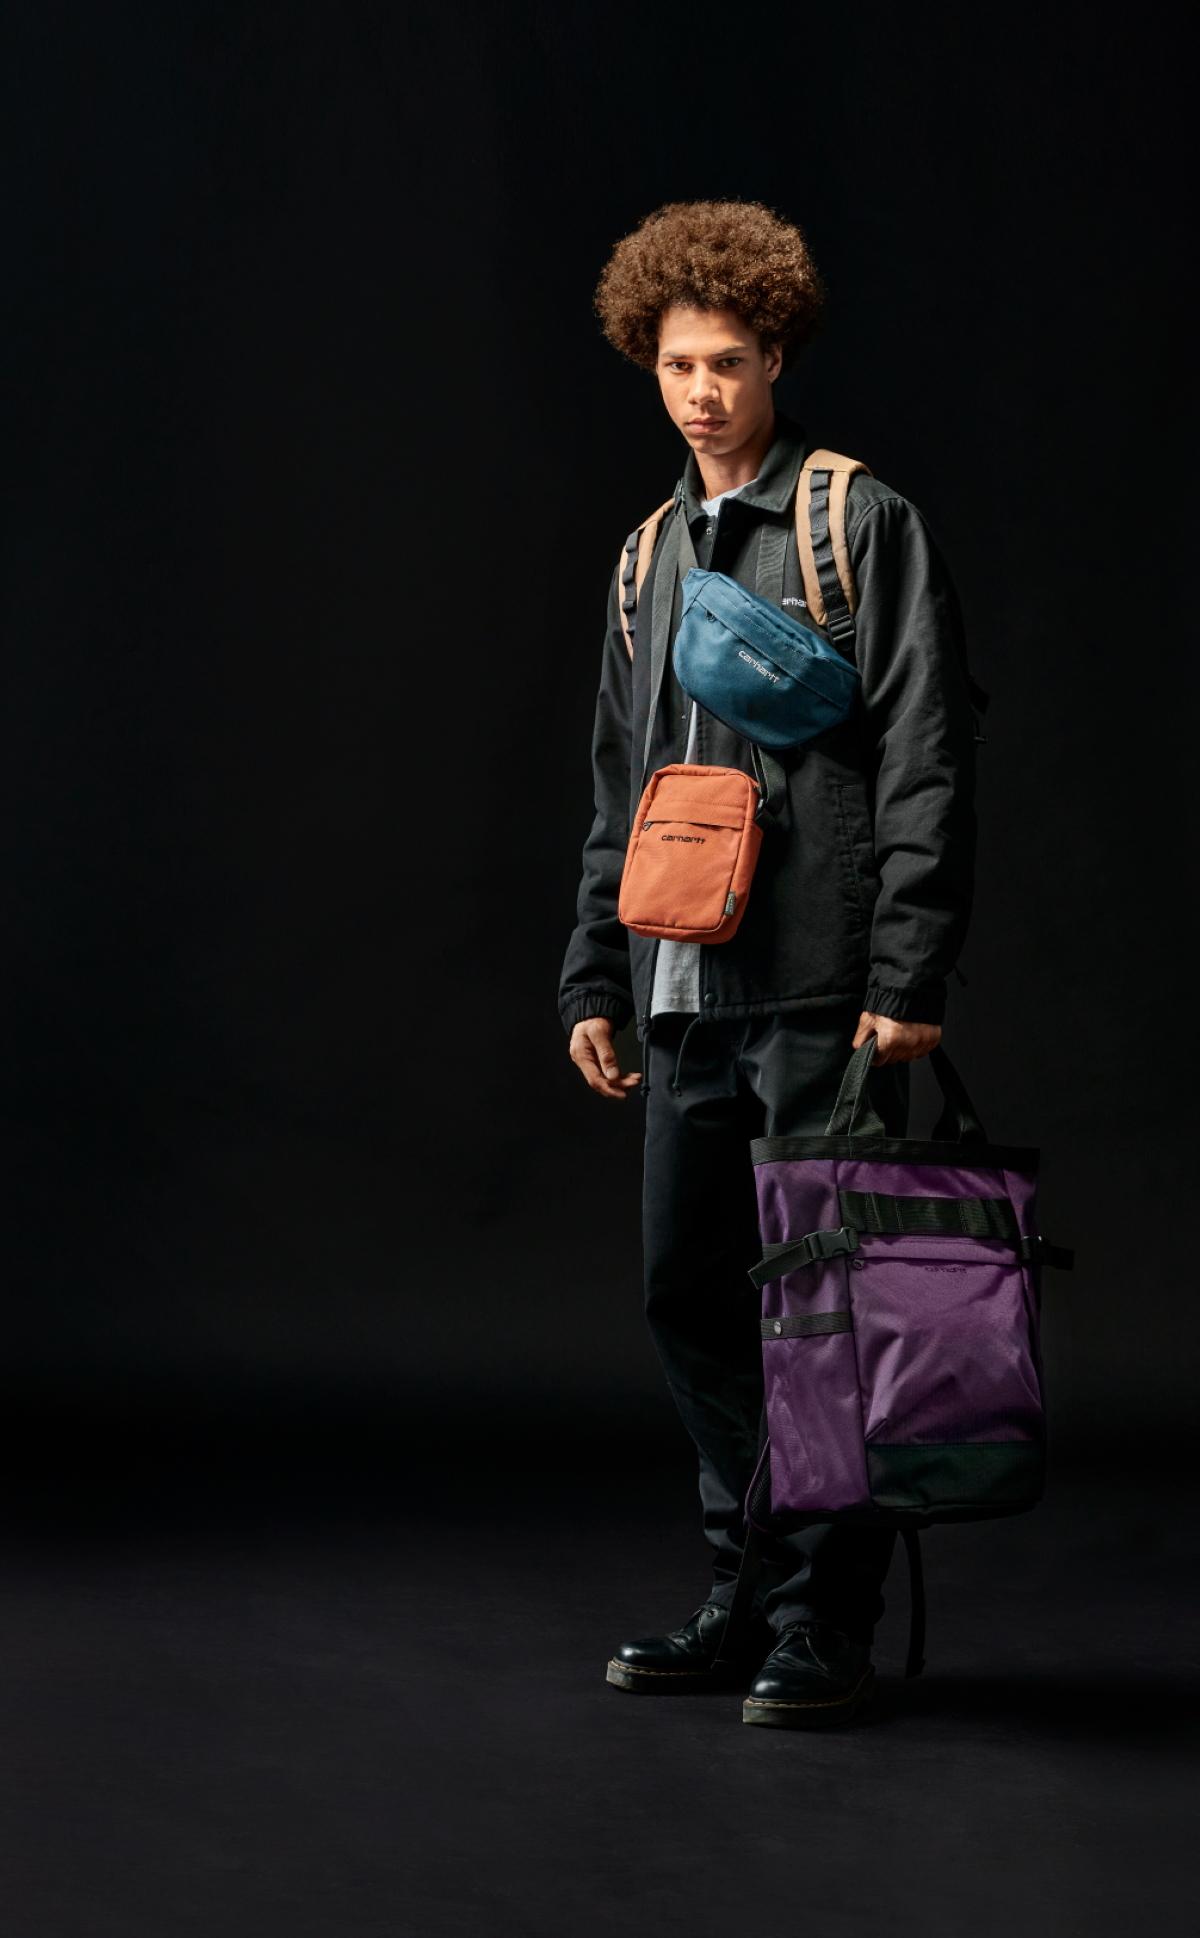 Carhartt-WIP-Fall-2020-Backpacks-Bags-Accessories2-2.jpg